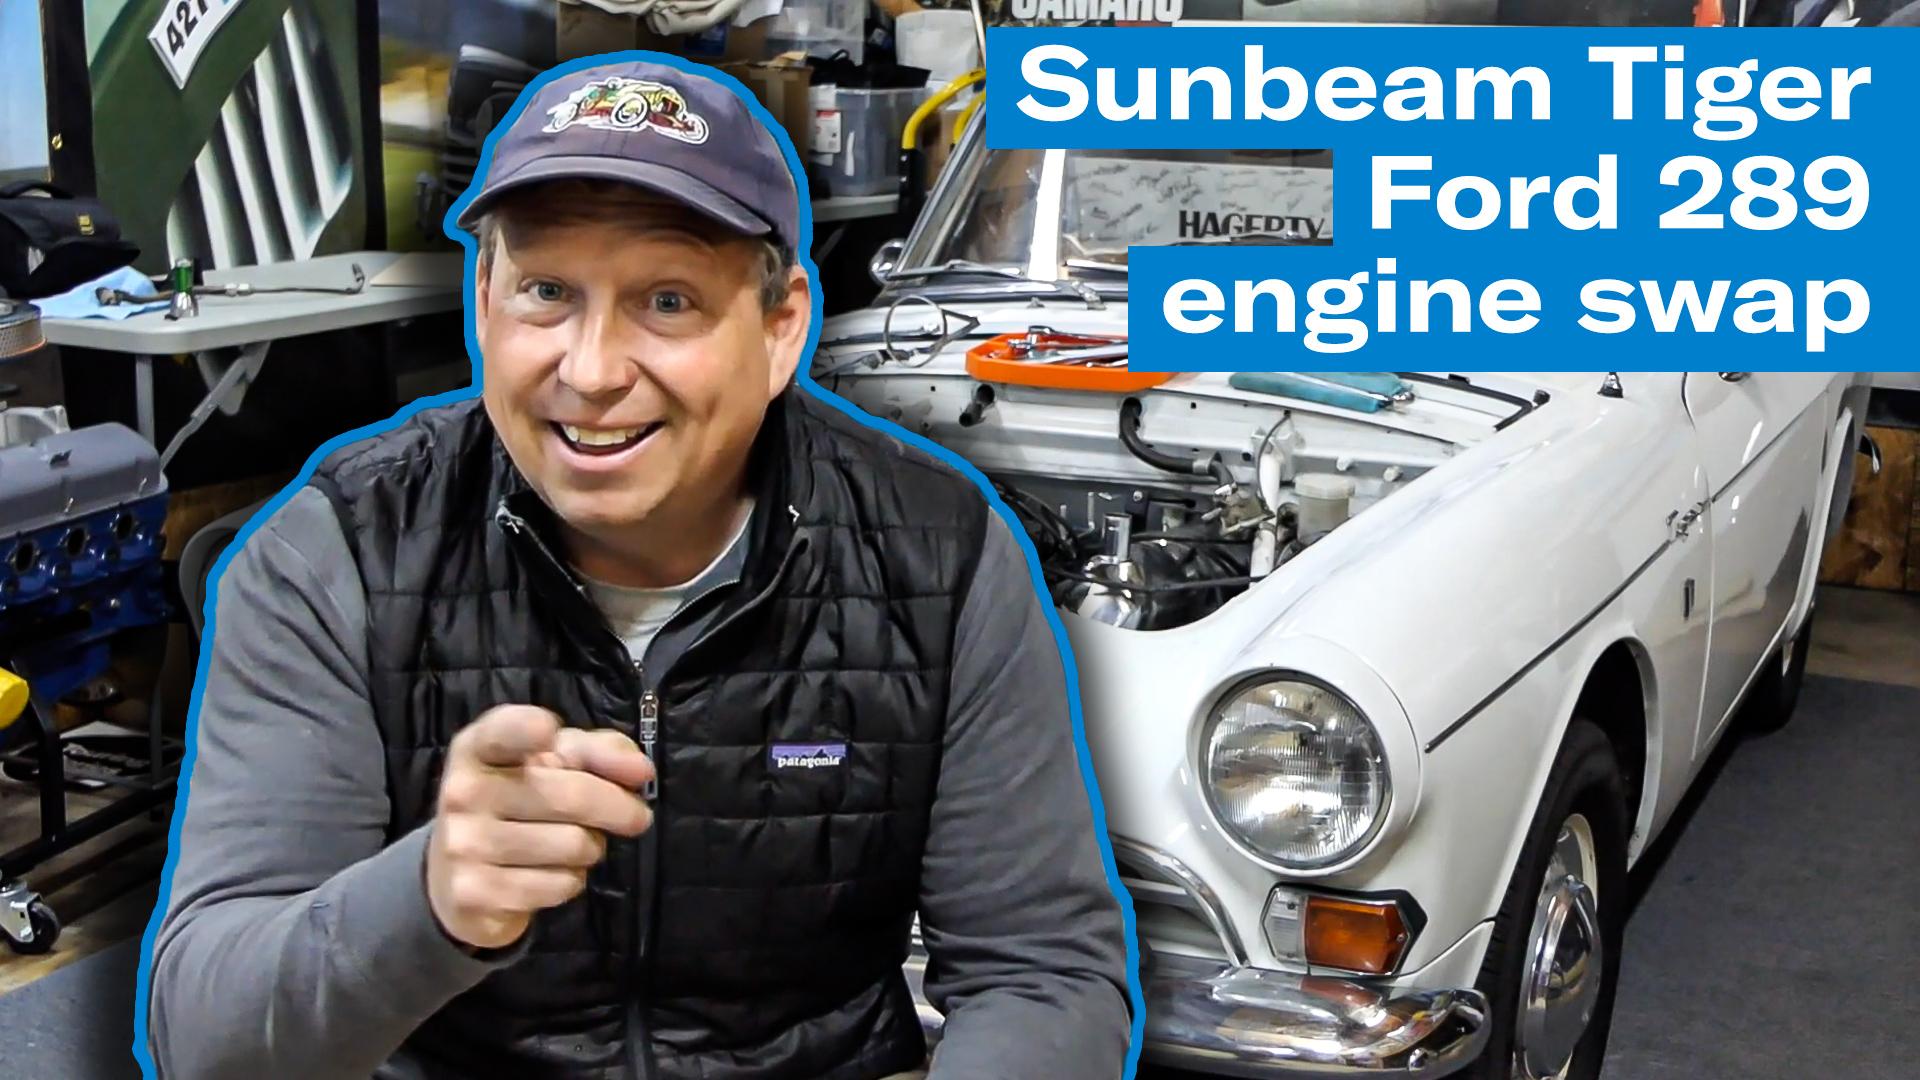 Sunbeam Tiger Ford 289 engine swap